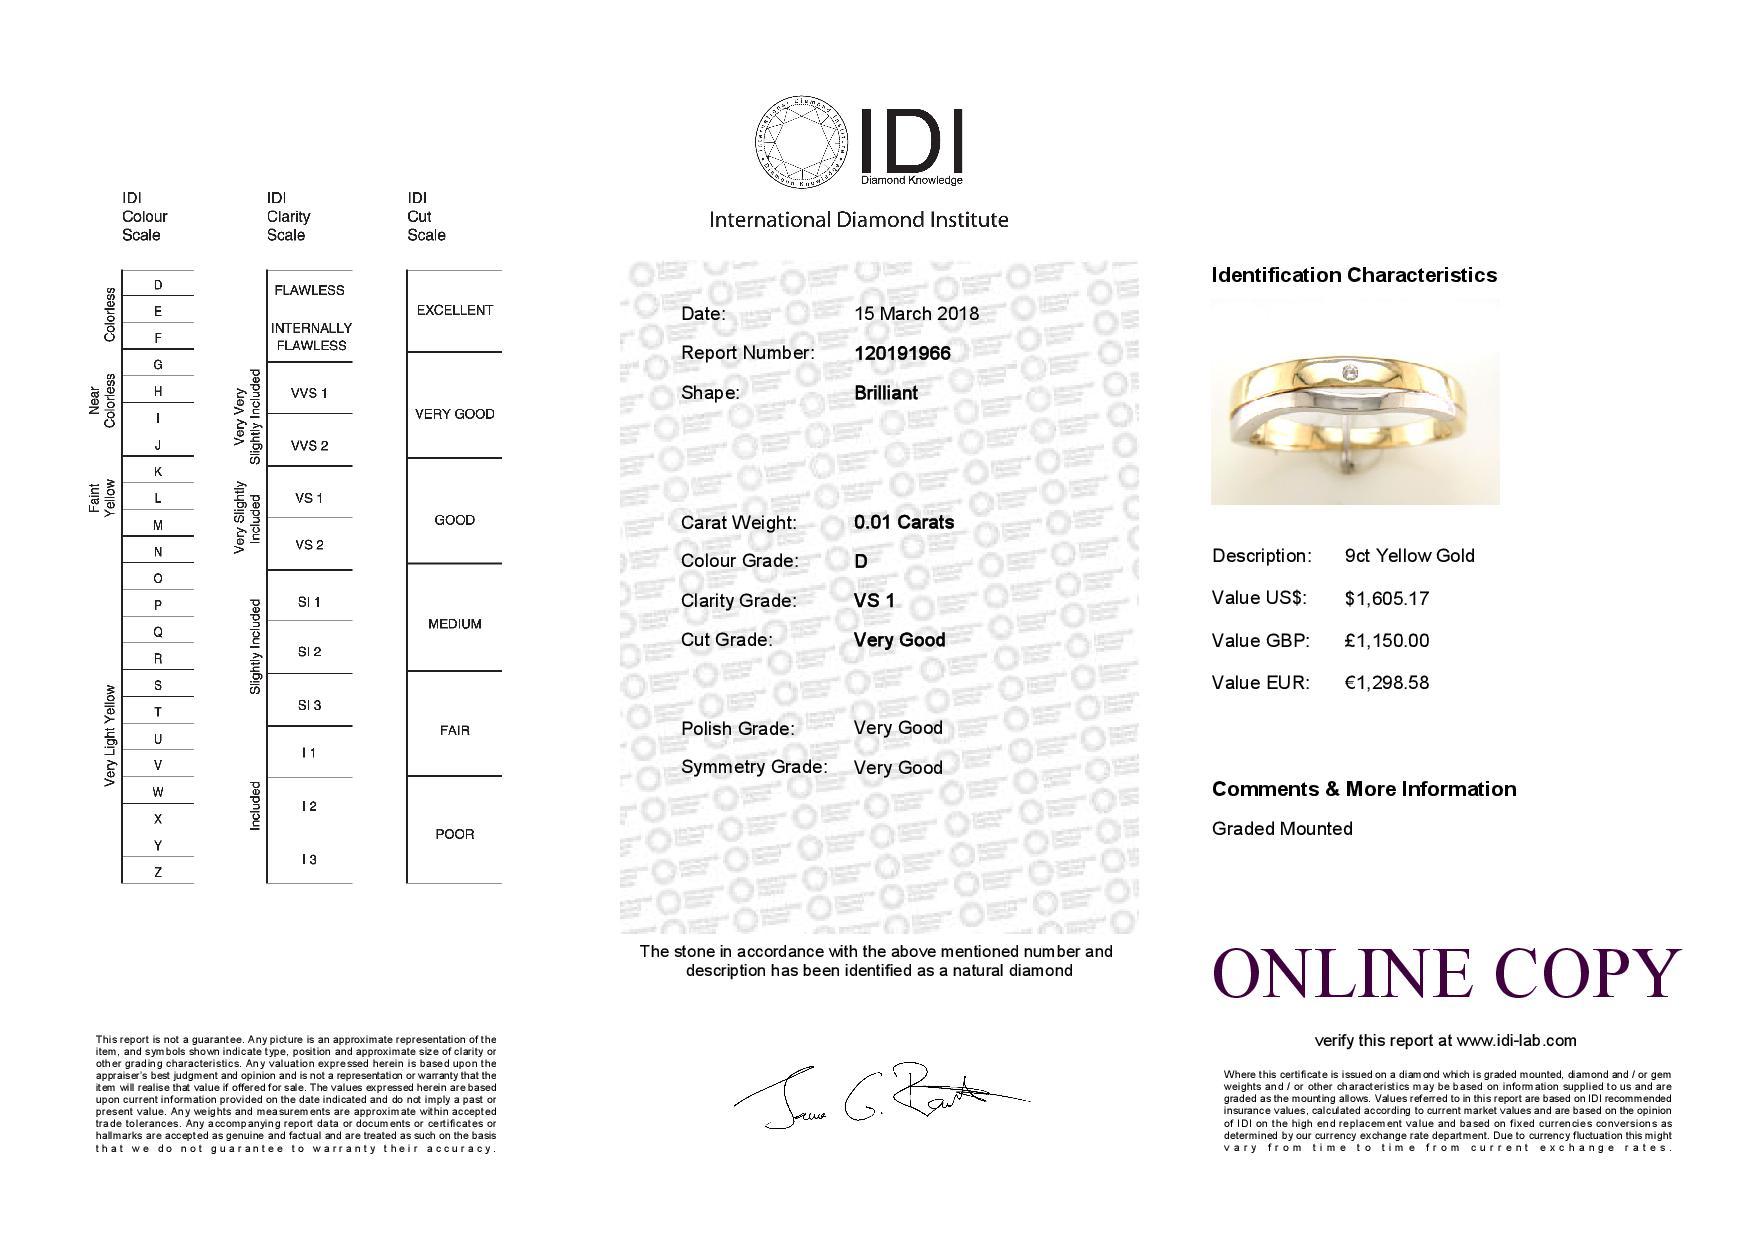 9ct Yellow Gold Single Stone Rub Over Set Diamond Ring - Image 5 of 5